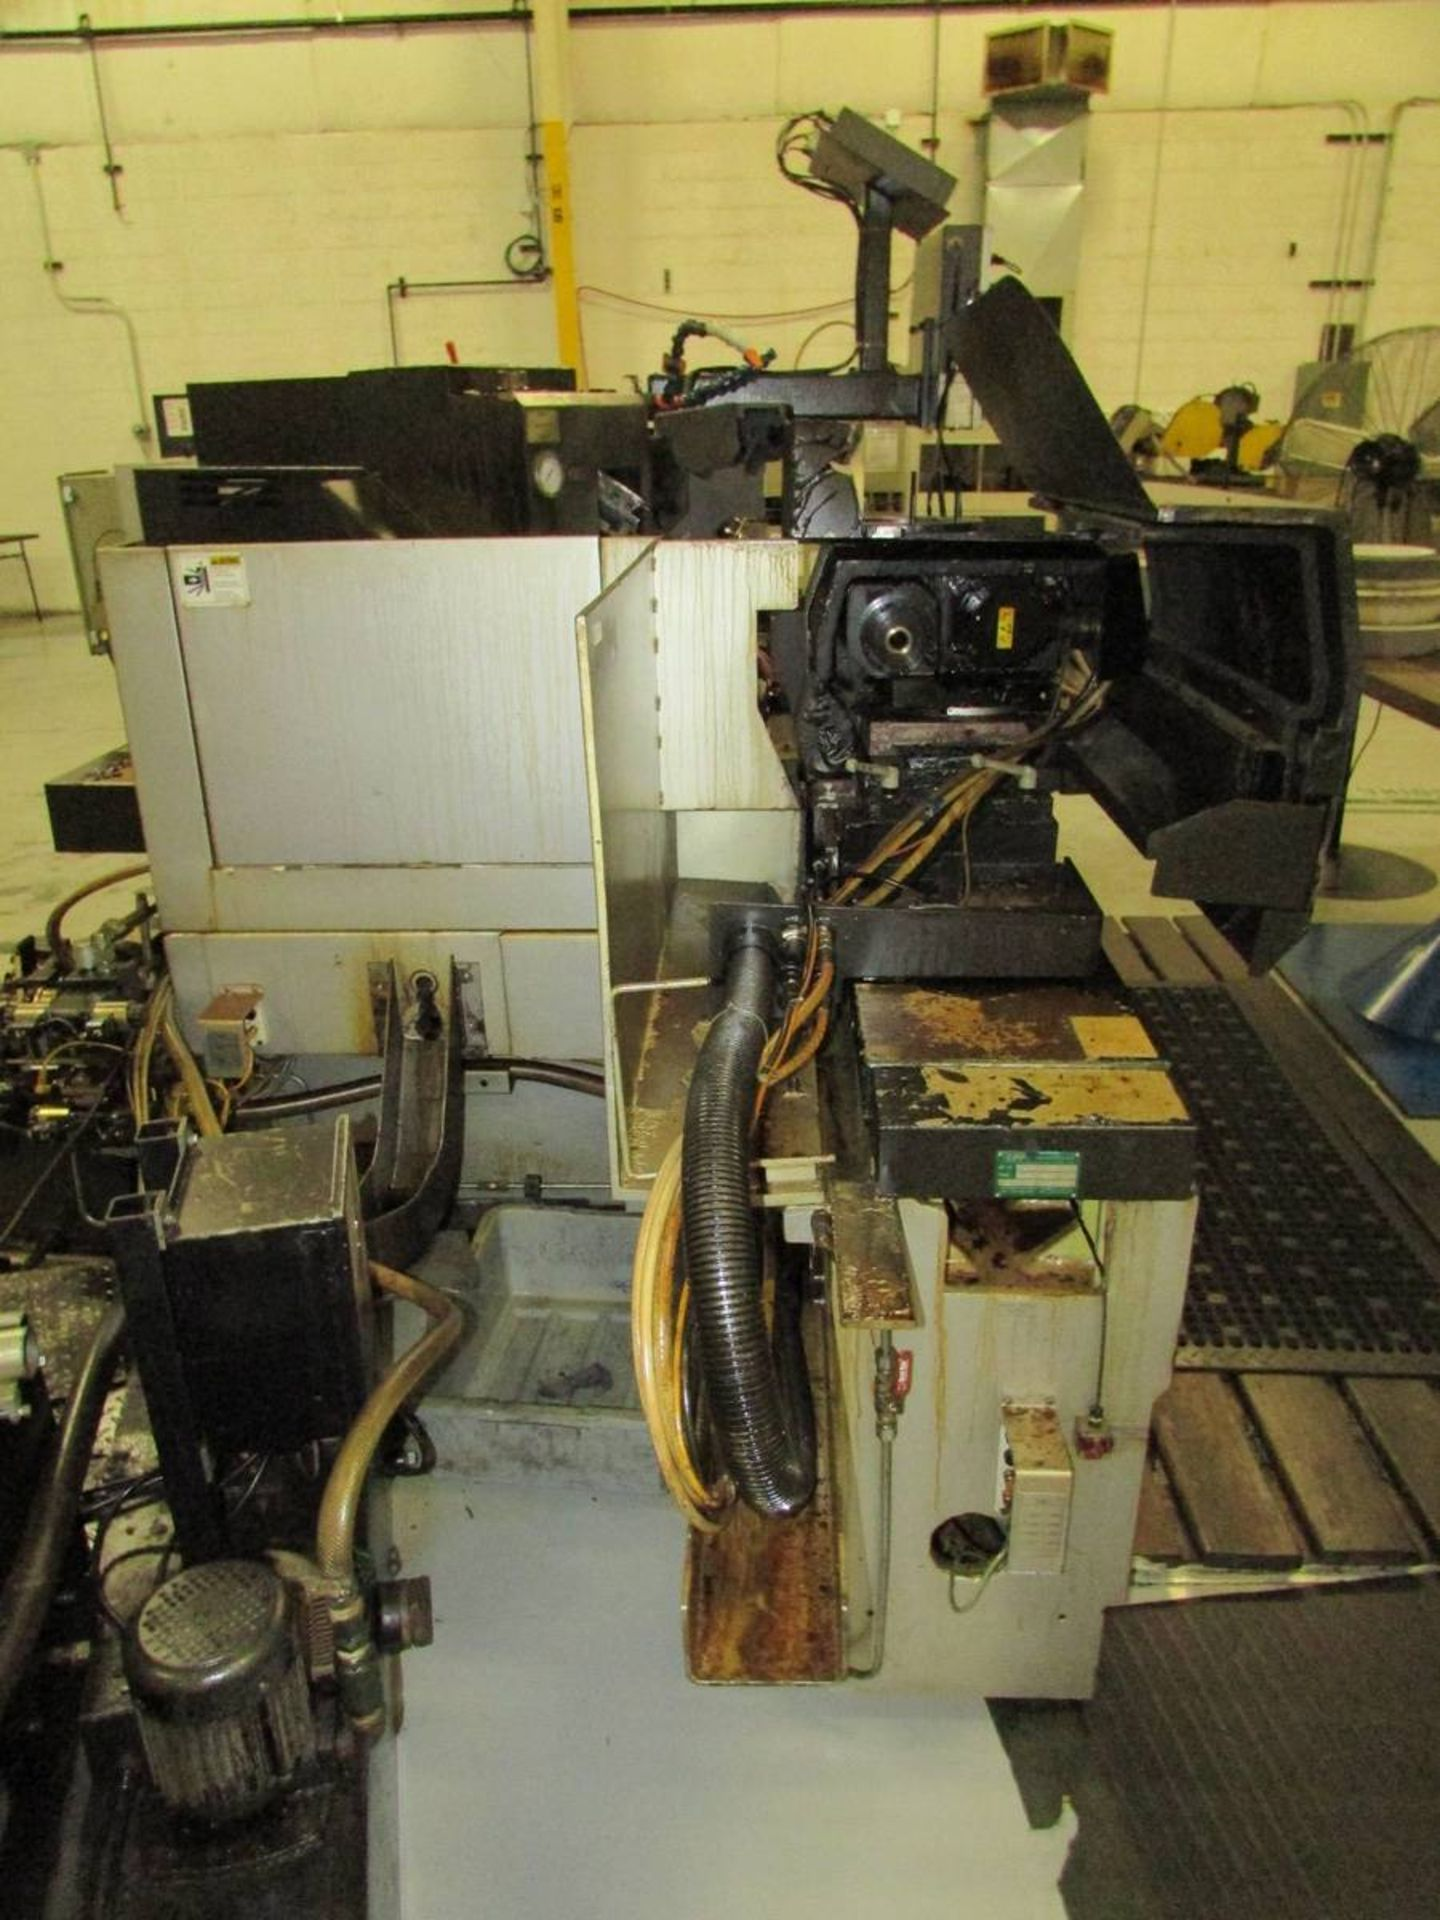 2012 Toyoda/ JTEKT 45m Select G II CNC OD Cylindrical Grinder - Image 11 of 21